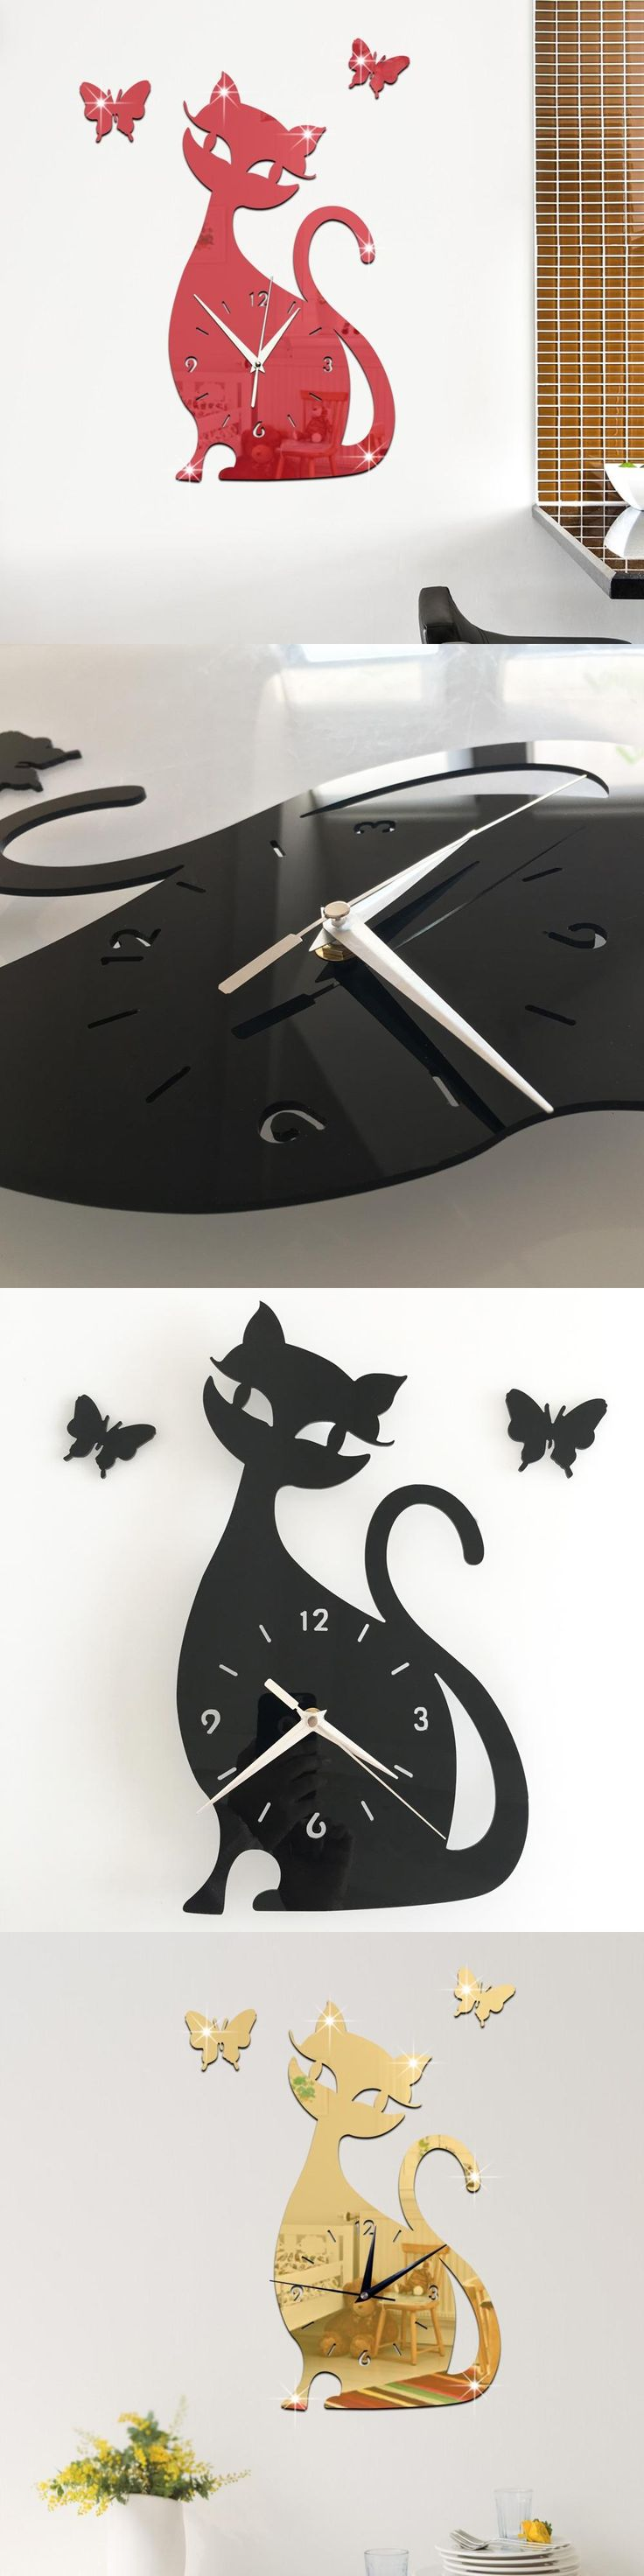 Best 25 cat clock ideas on pinterest kit kat clock go to clock orologio da parete cute black cat clock kids bedroom wall sticker decoration mirror clock 3d cartoon amipublicfo Gallery